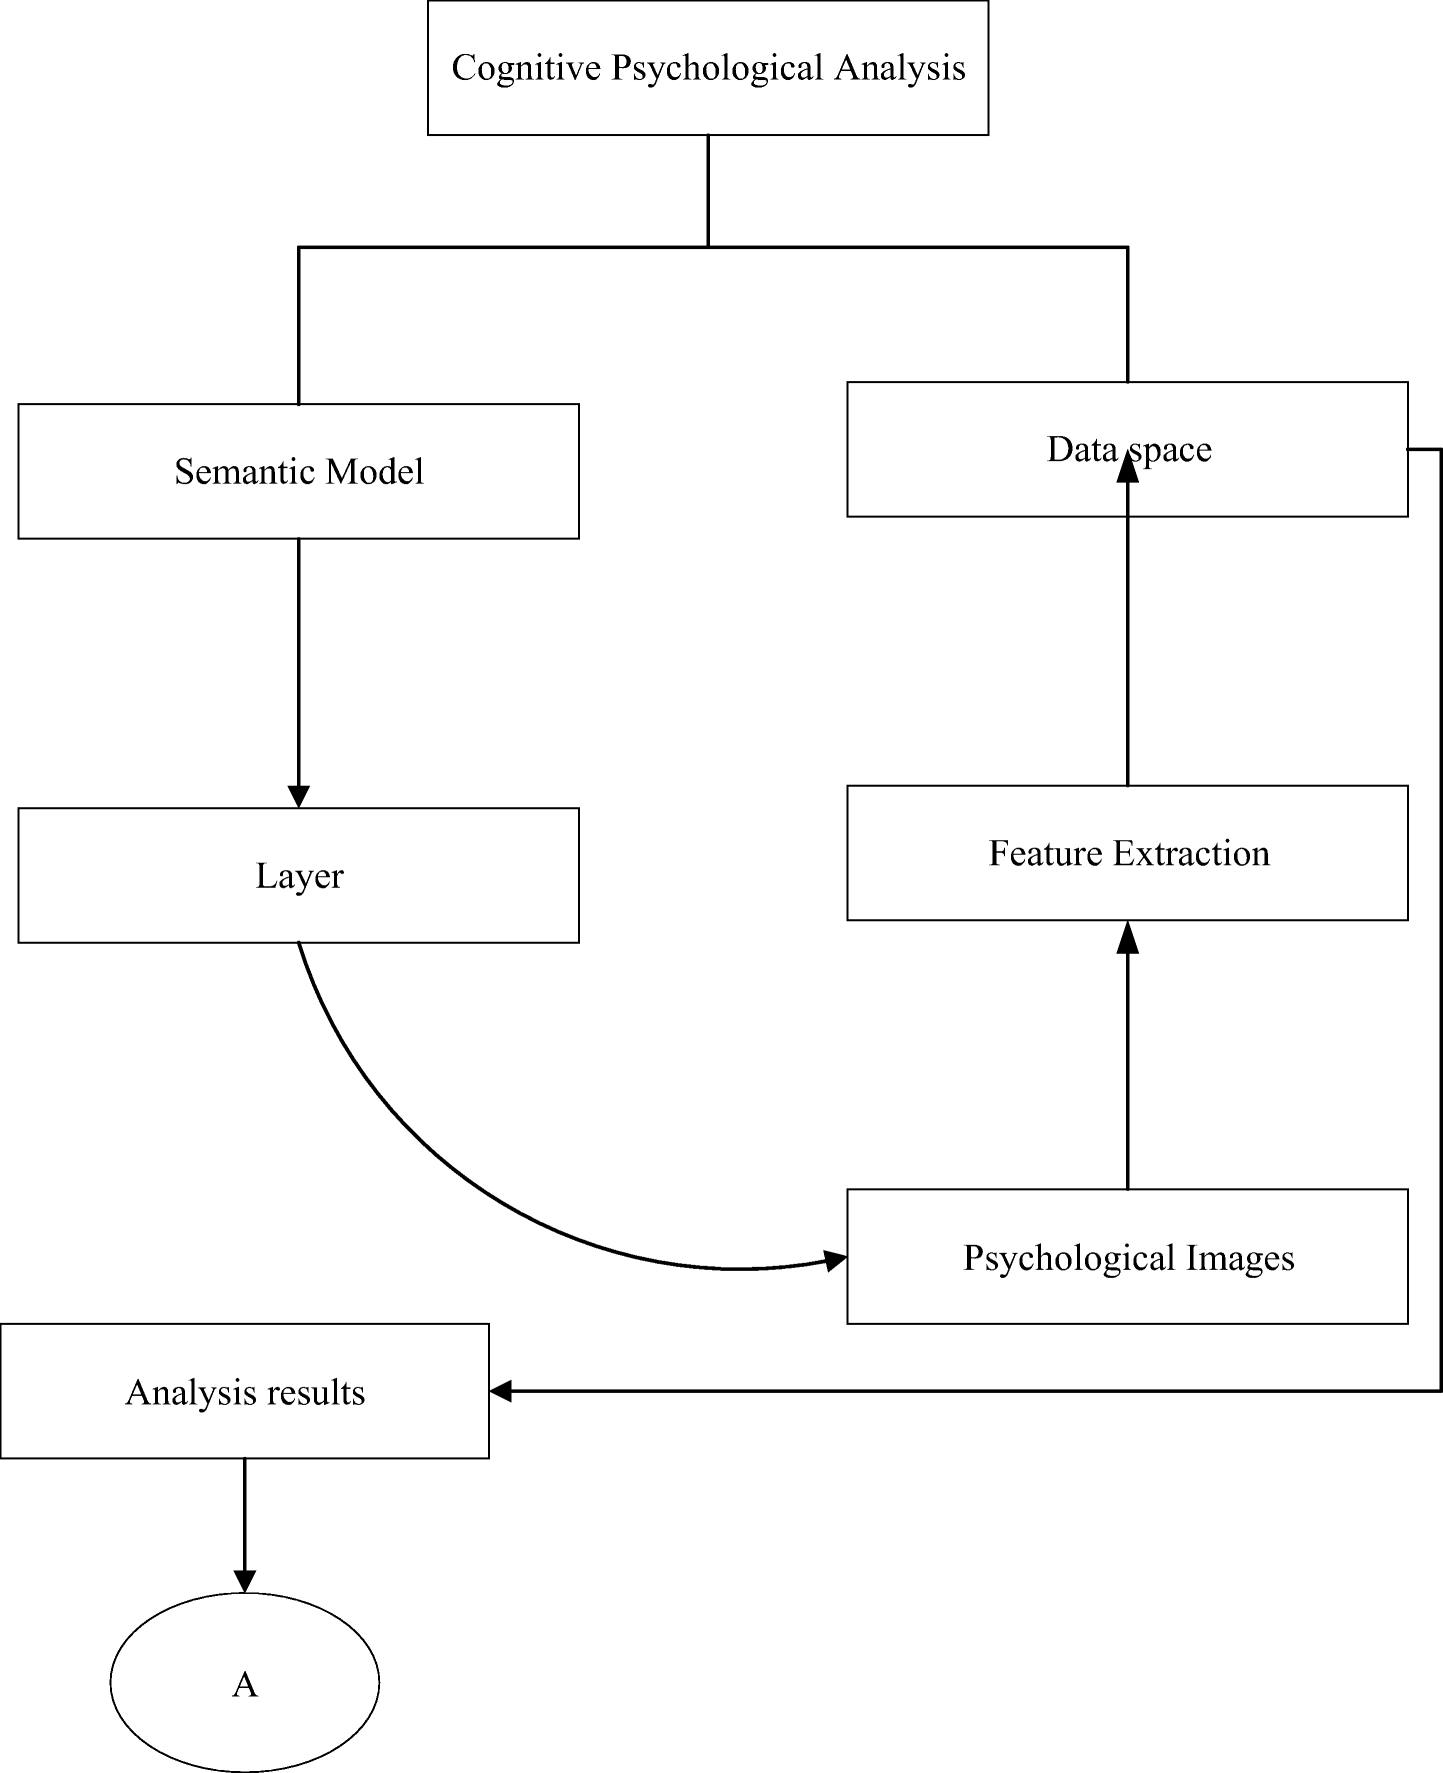 Cognitive psychological analysis based on multilayer semantics of